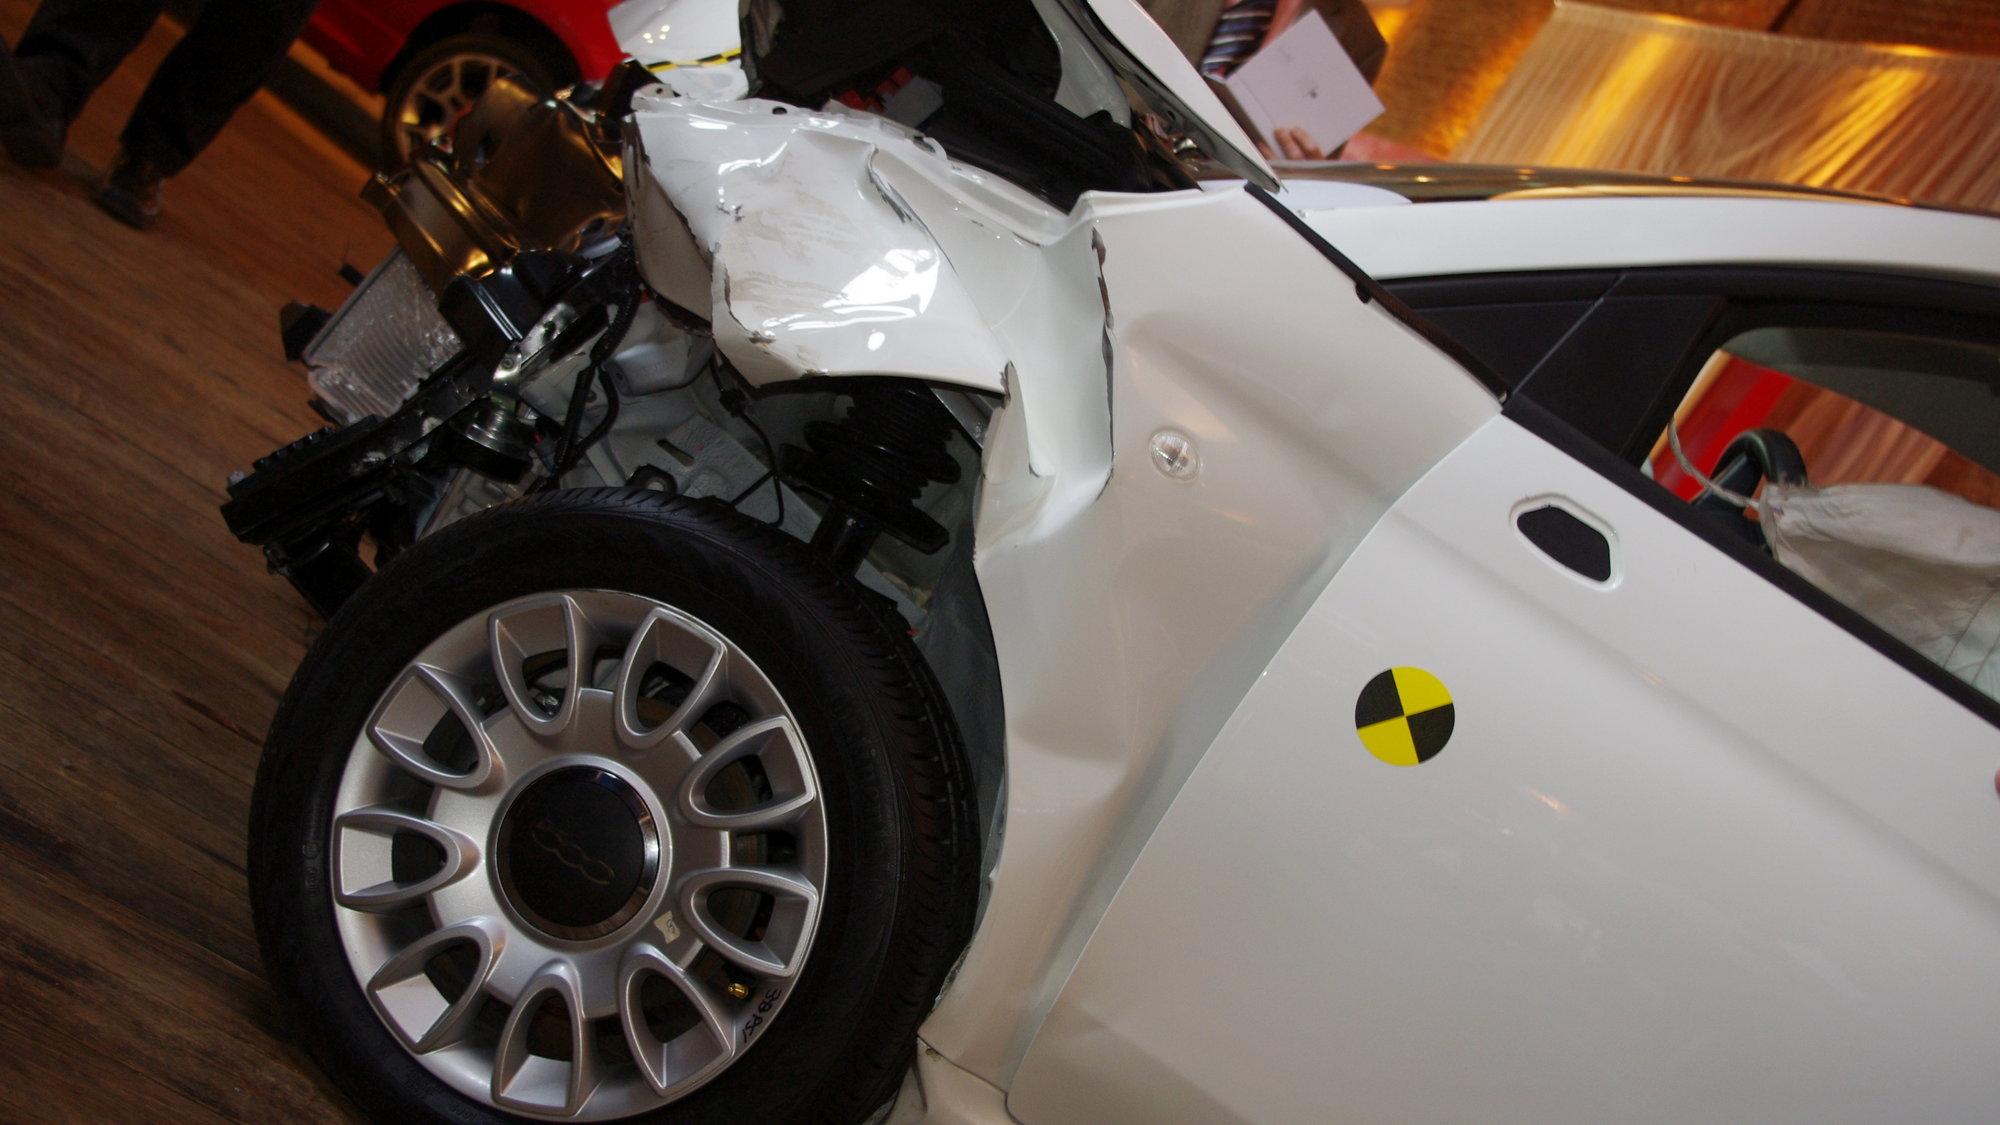 Impressive crash protection